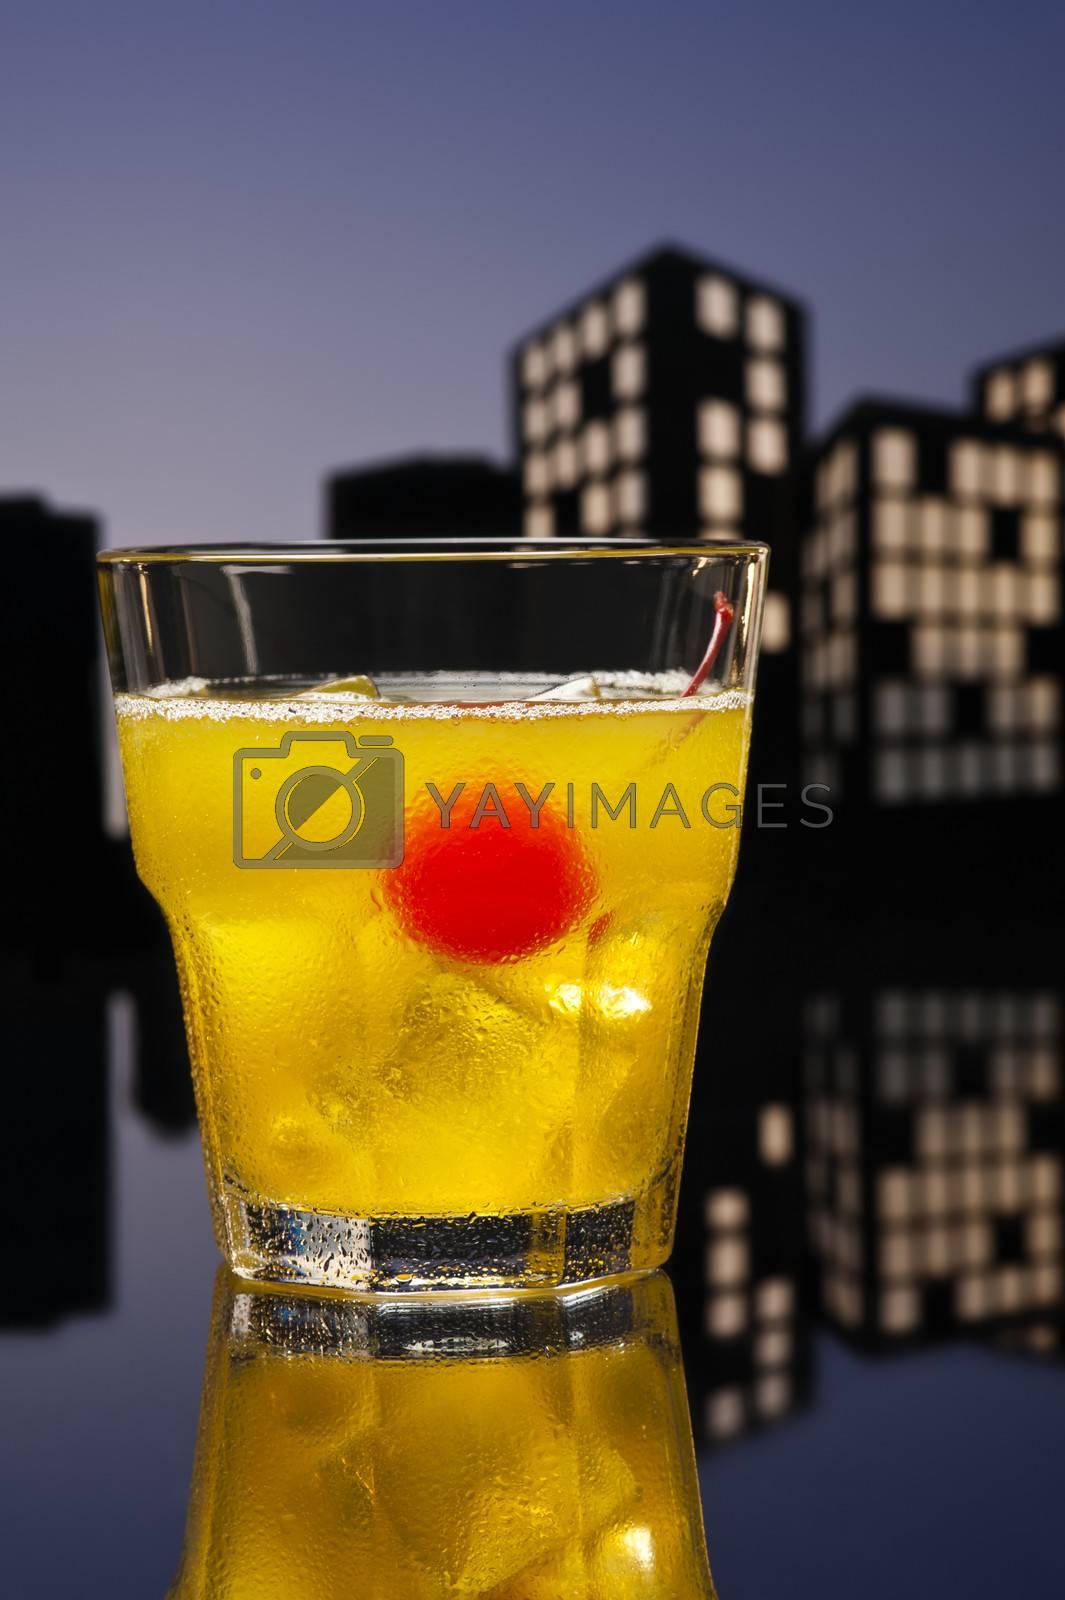 Metropolis Skrew Drivercocktail in city skyline setting